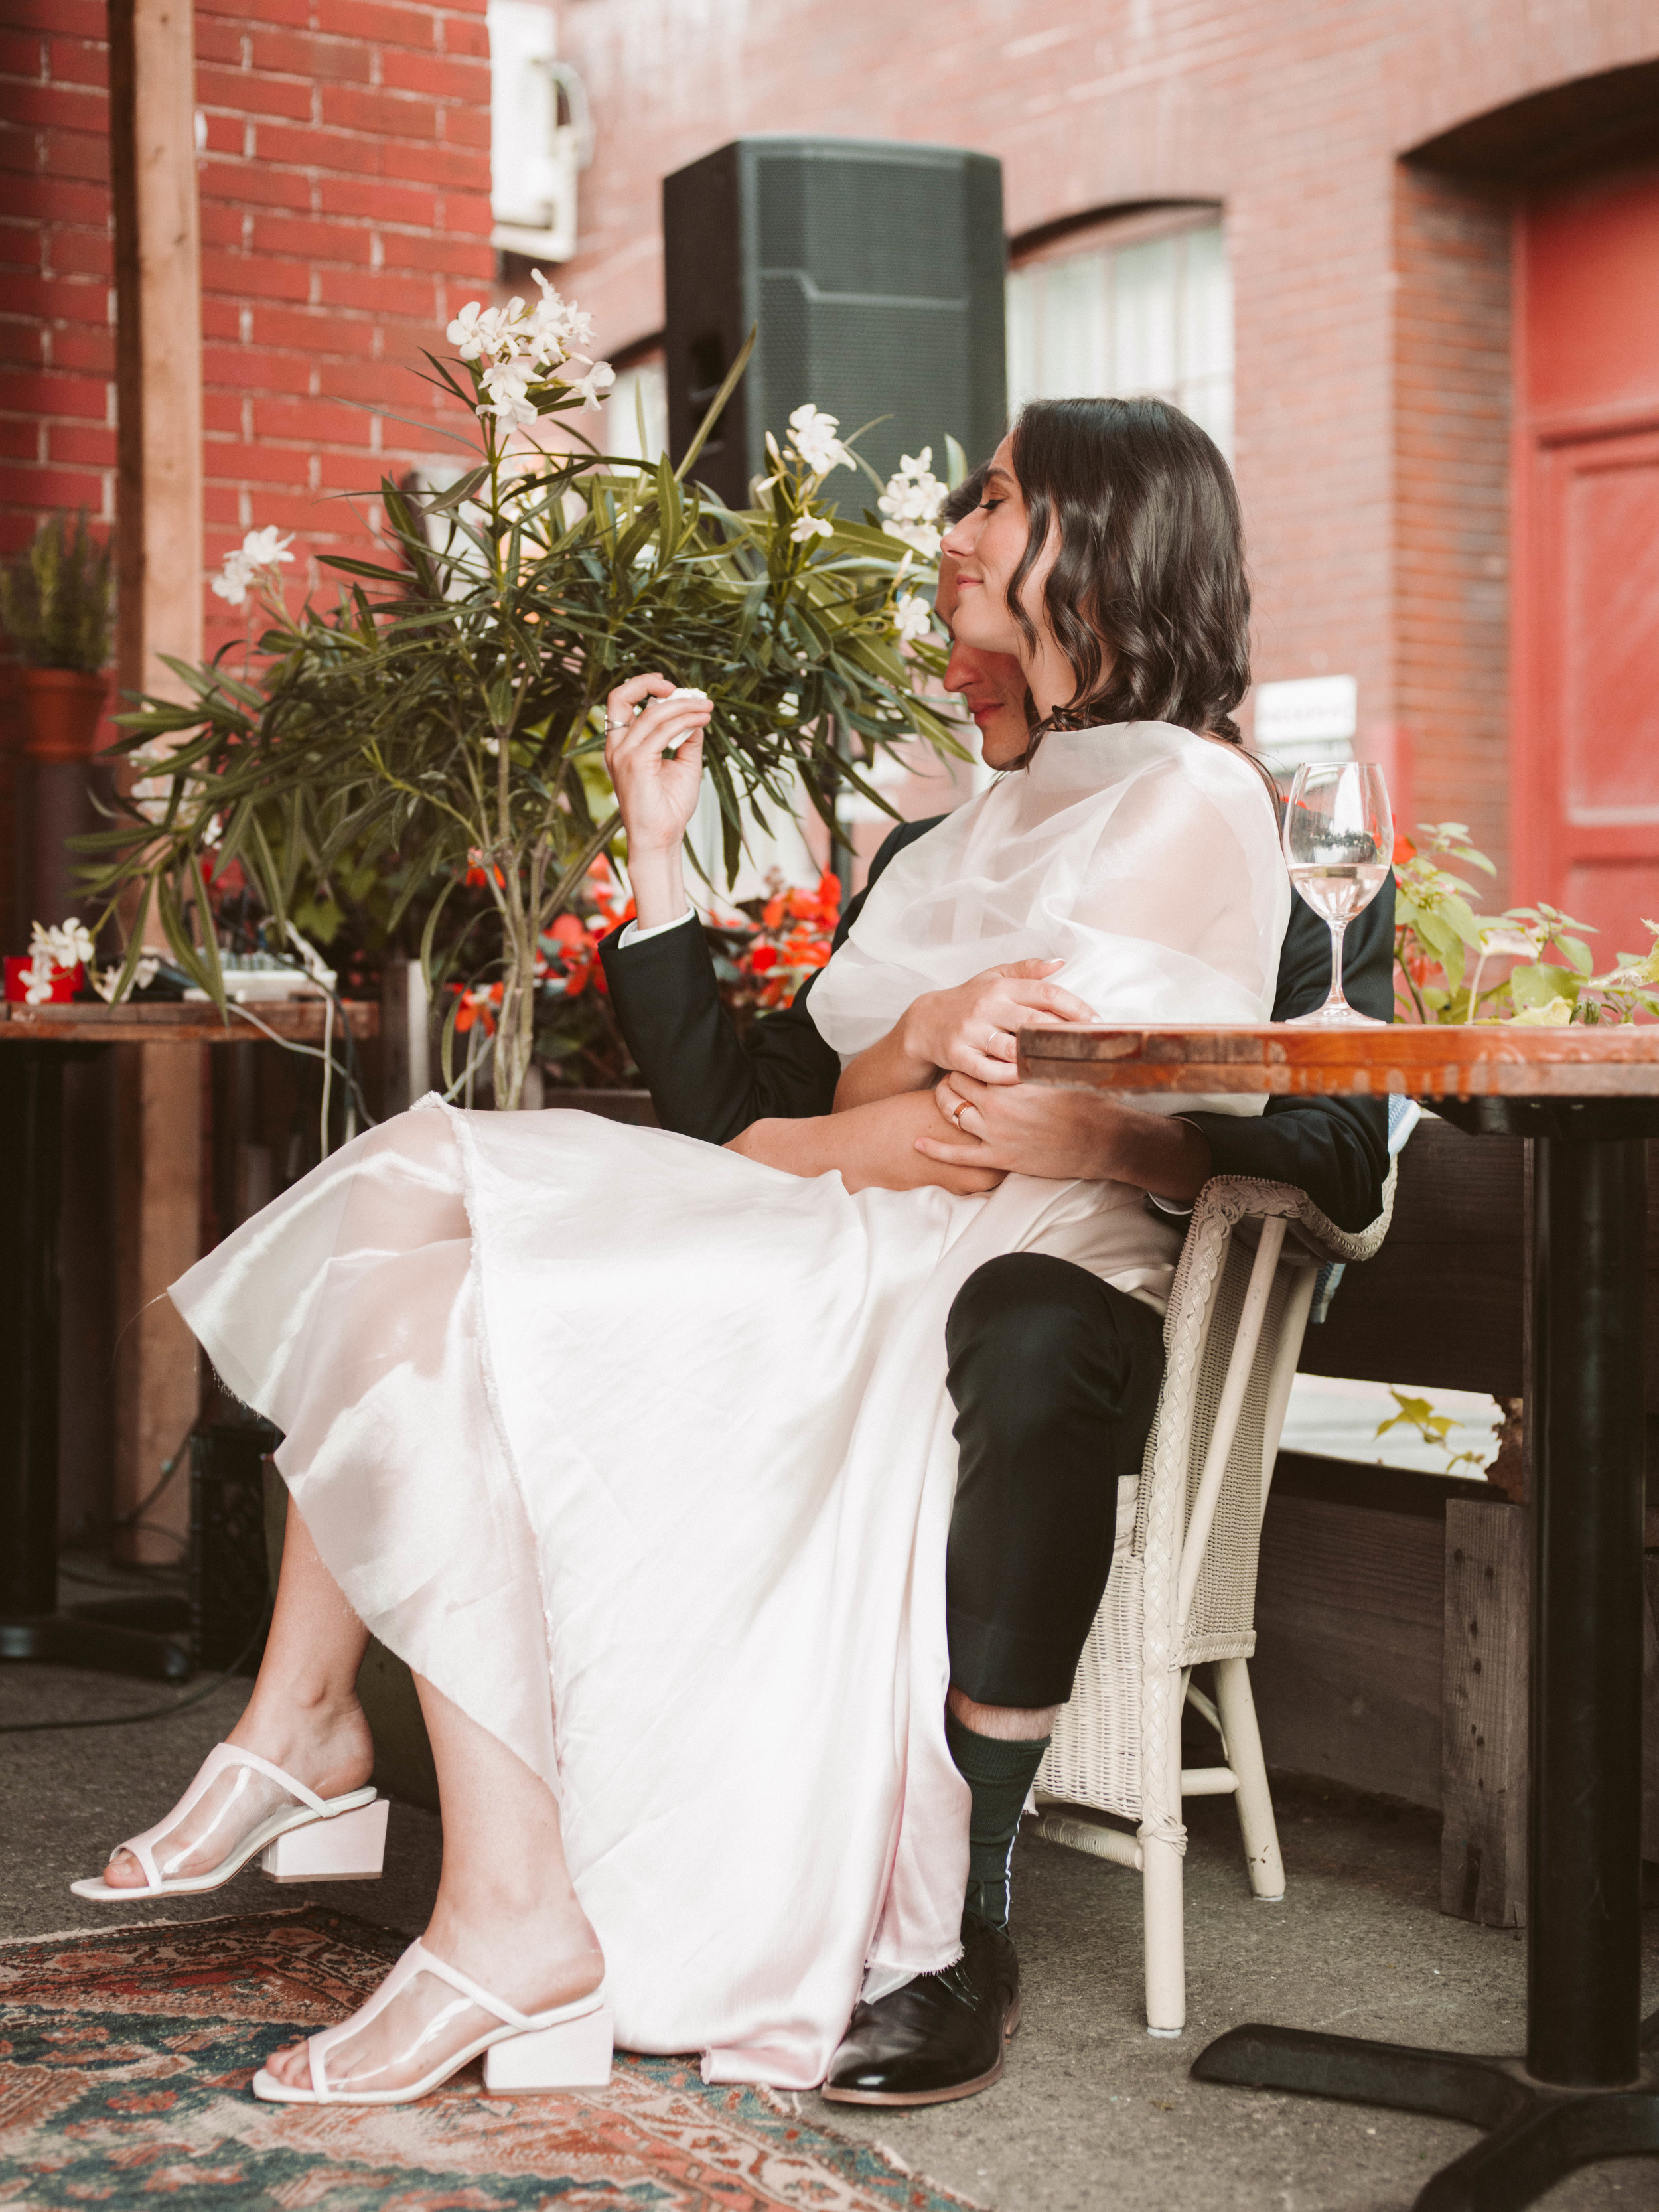 Tim-Darcy_Amy-Fort_Wedding_2019-9967.jpg